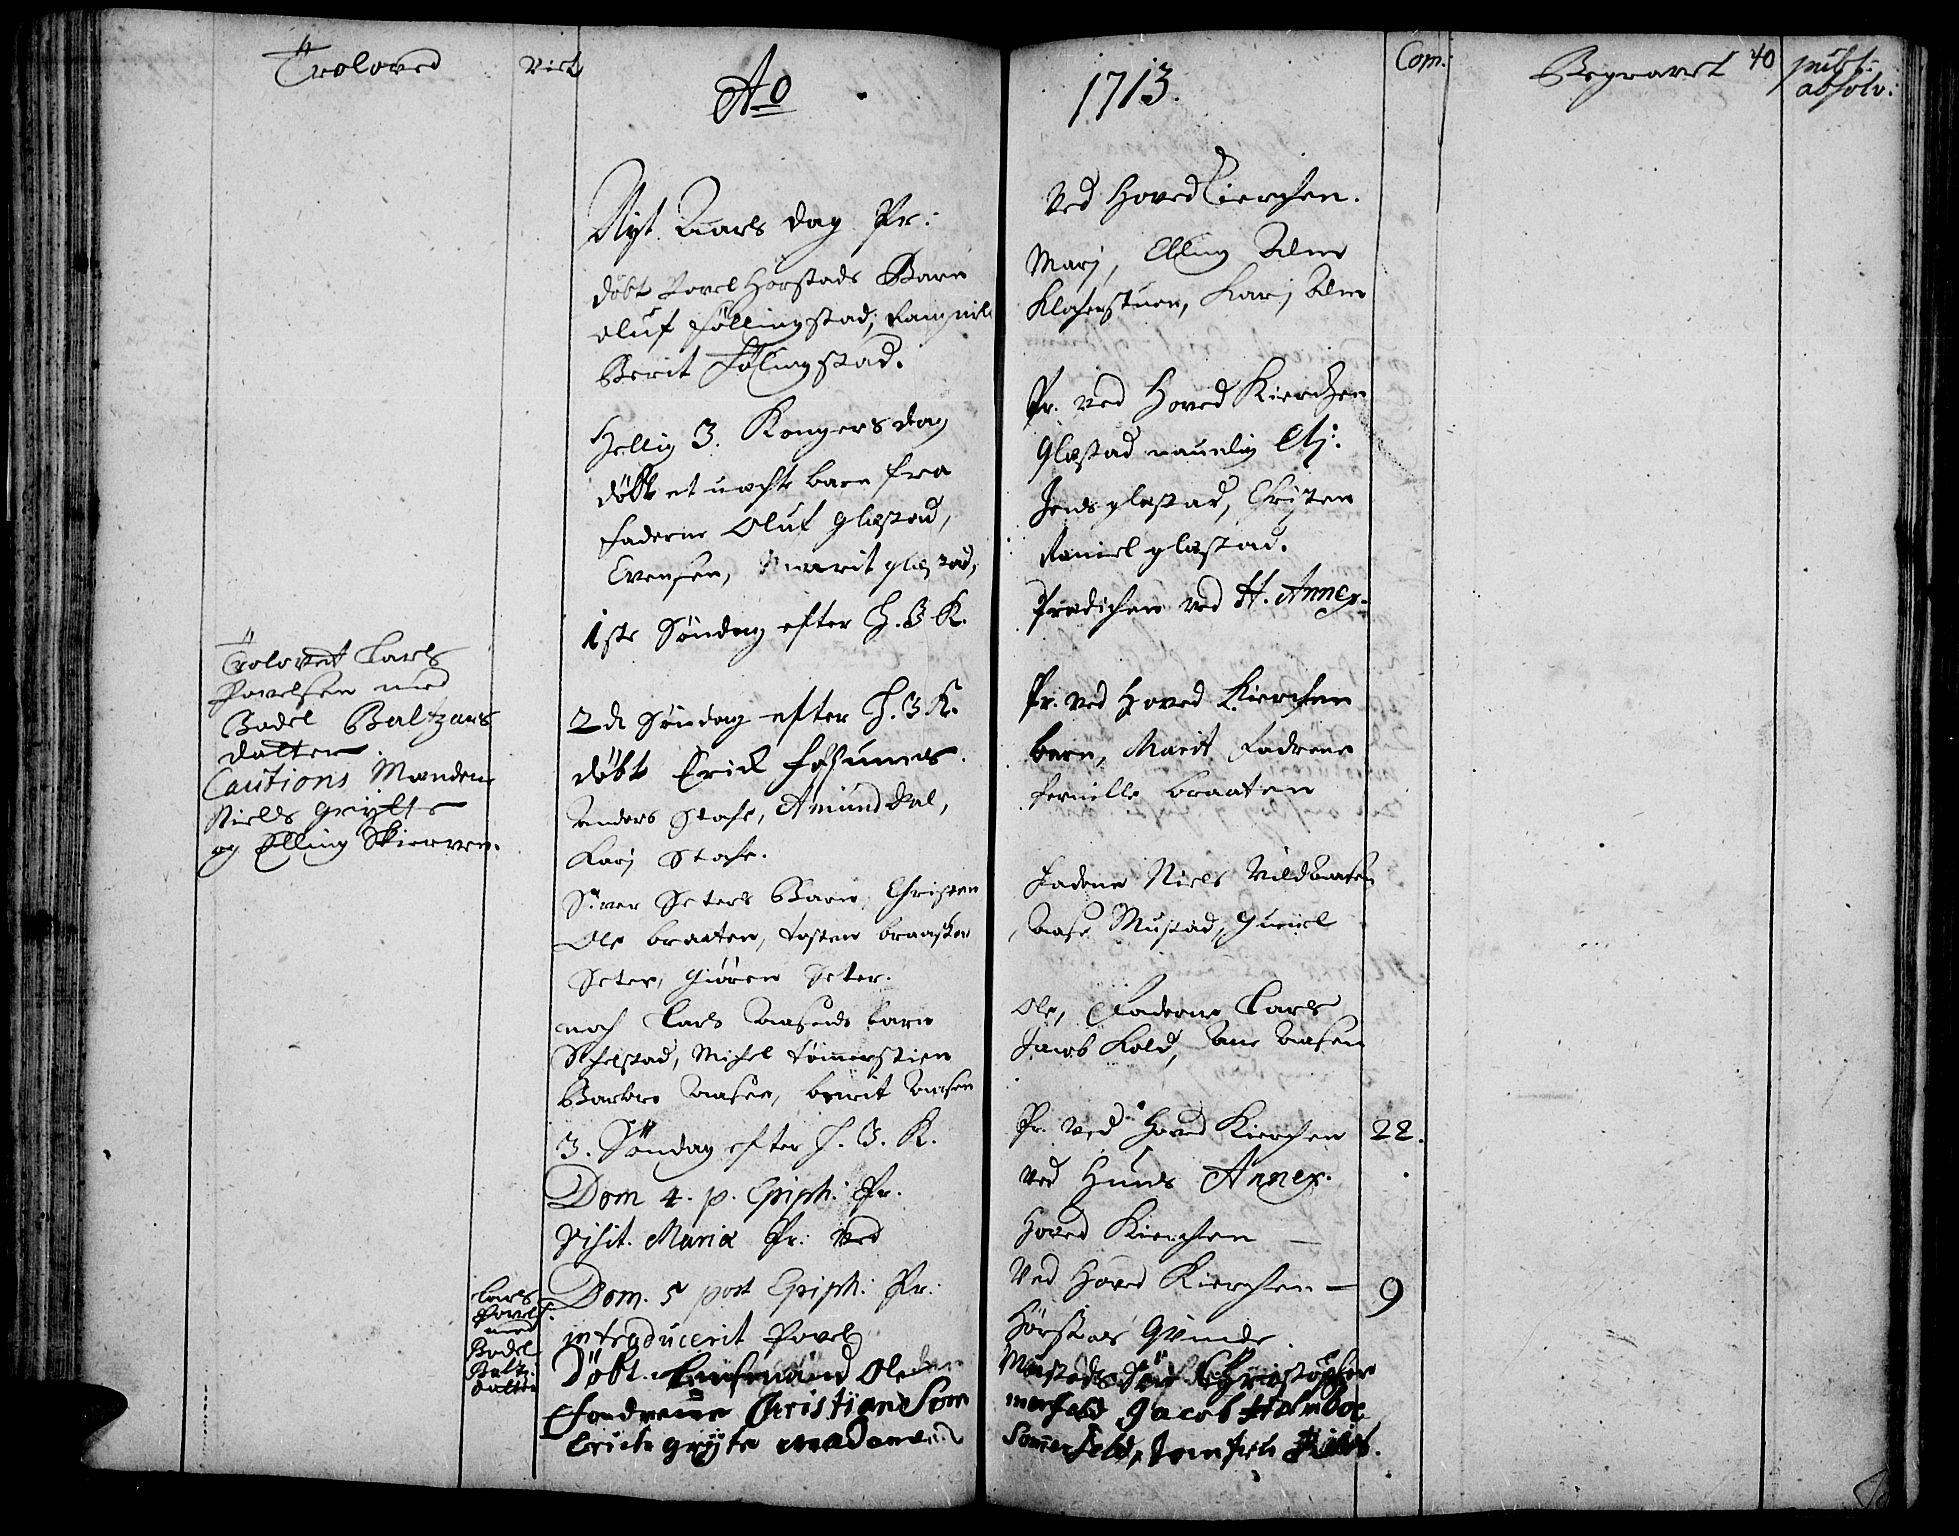 SAH, Vardal prestekontor, H/Ha/Haa/L0001: Ministerialbok nr. 1, 1706-1748, s. 40